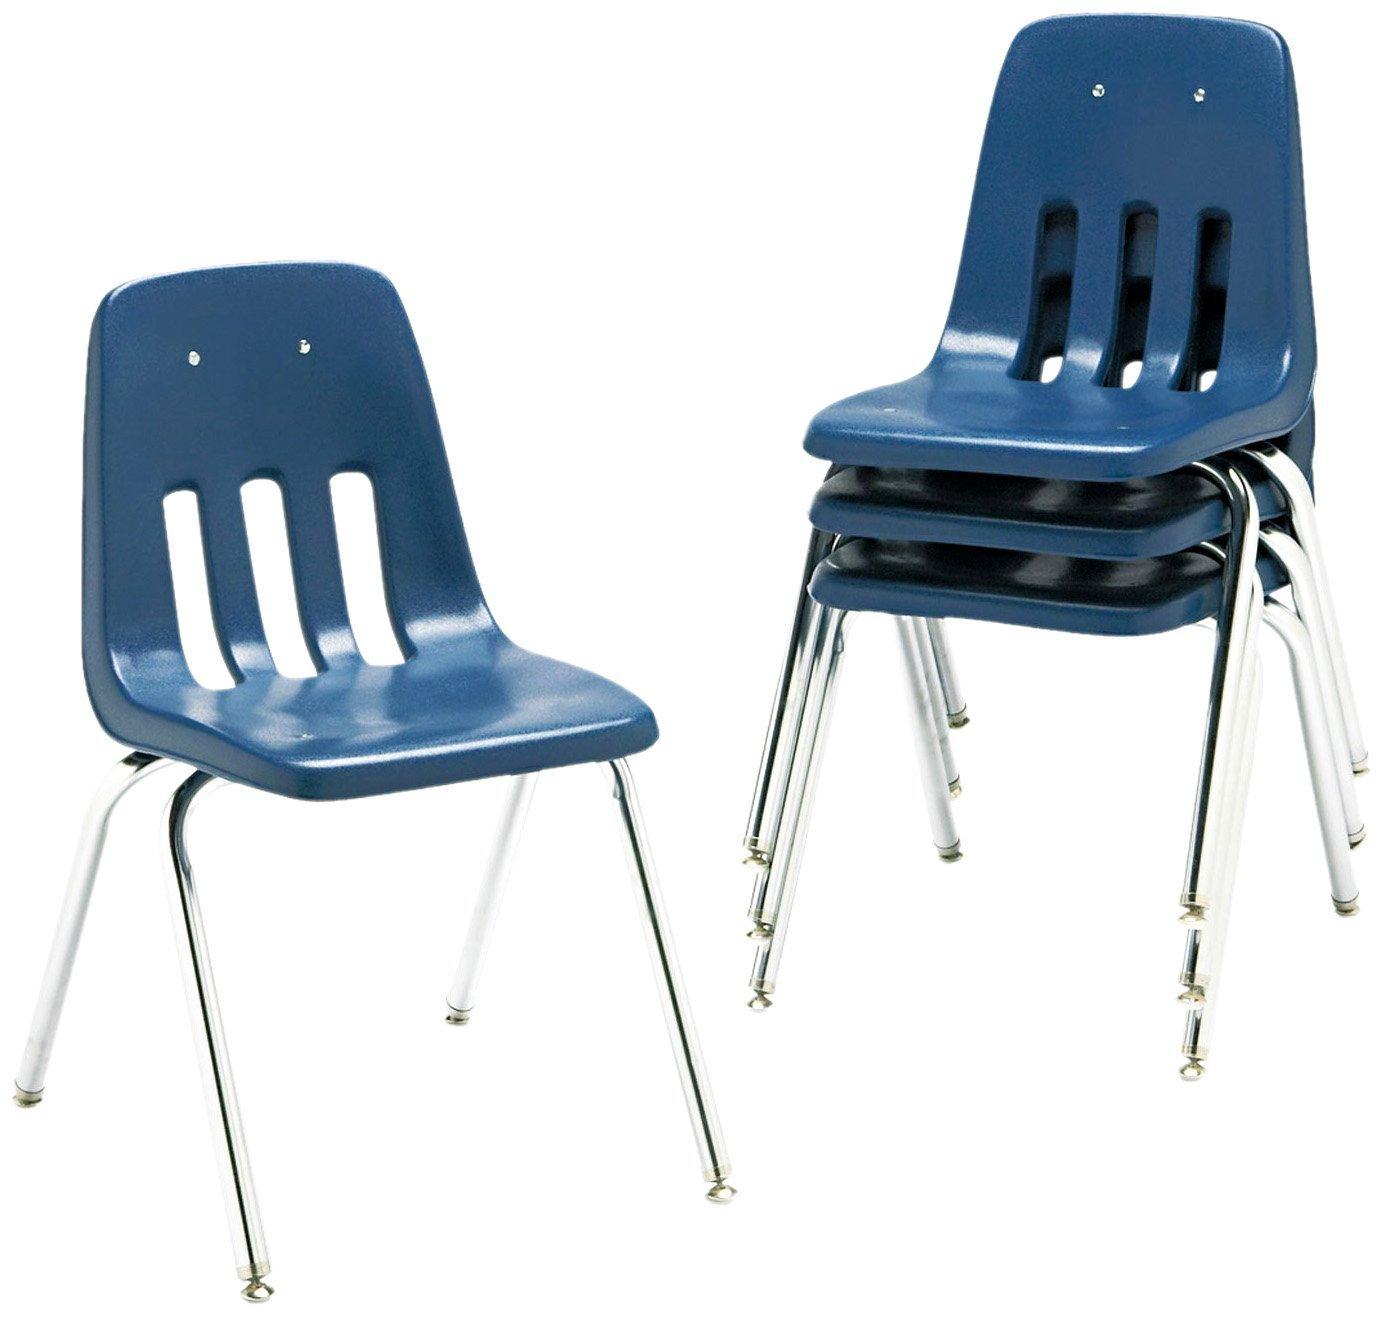 Virco Student Chair, Navy, Soft Plastic Shell, 14'' Seat Height, Chrome Frame, for Kindergarten - 2nd Grade, 4 Pack (9014-BLU51) by Virco